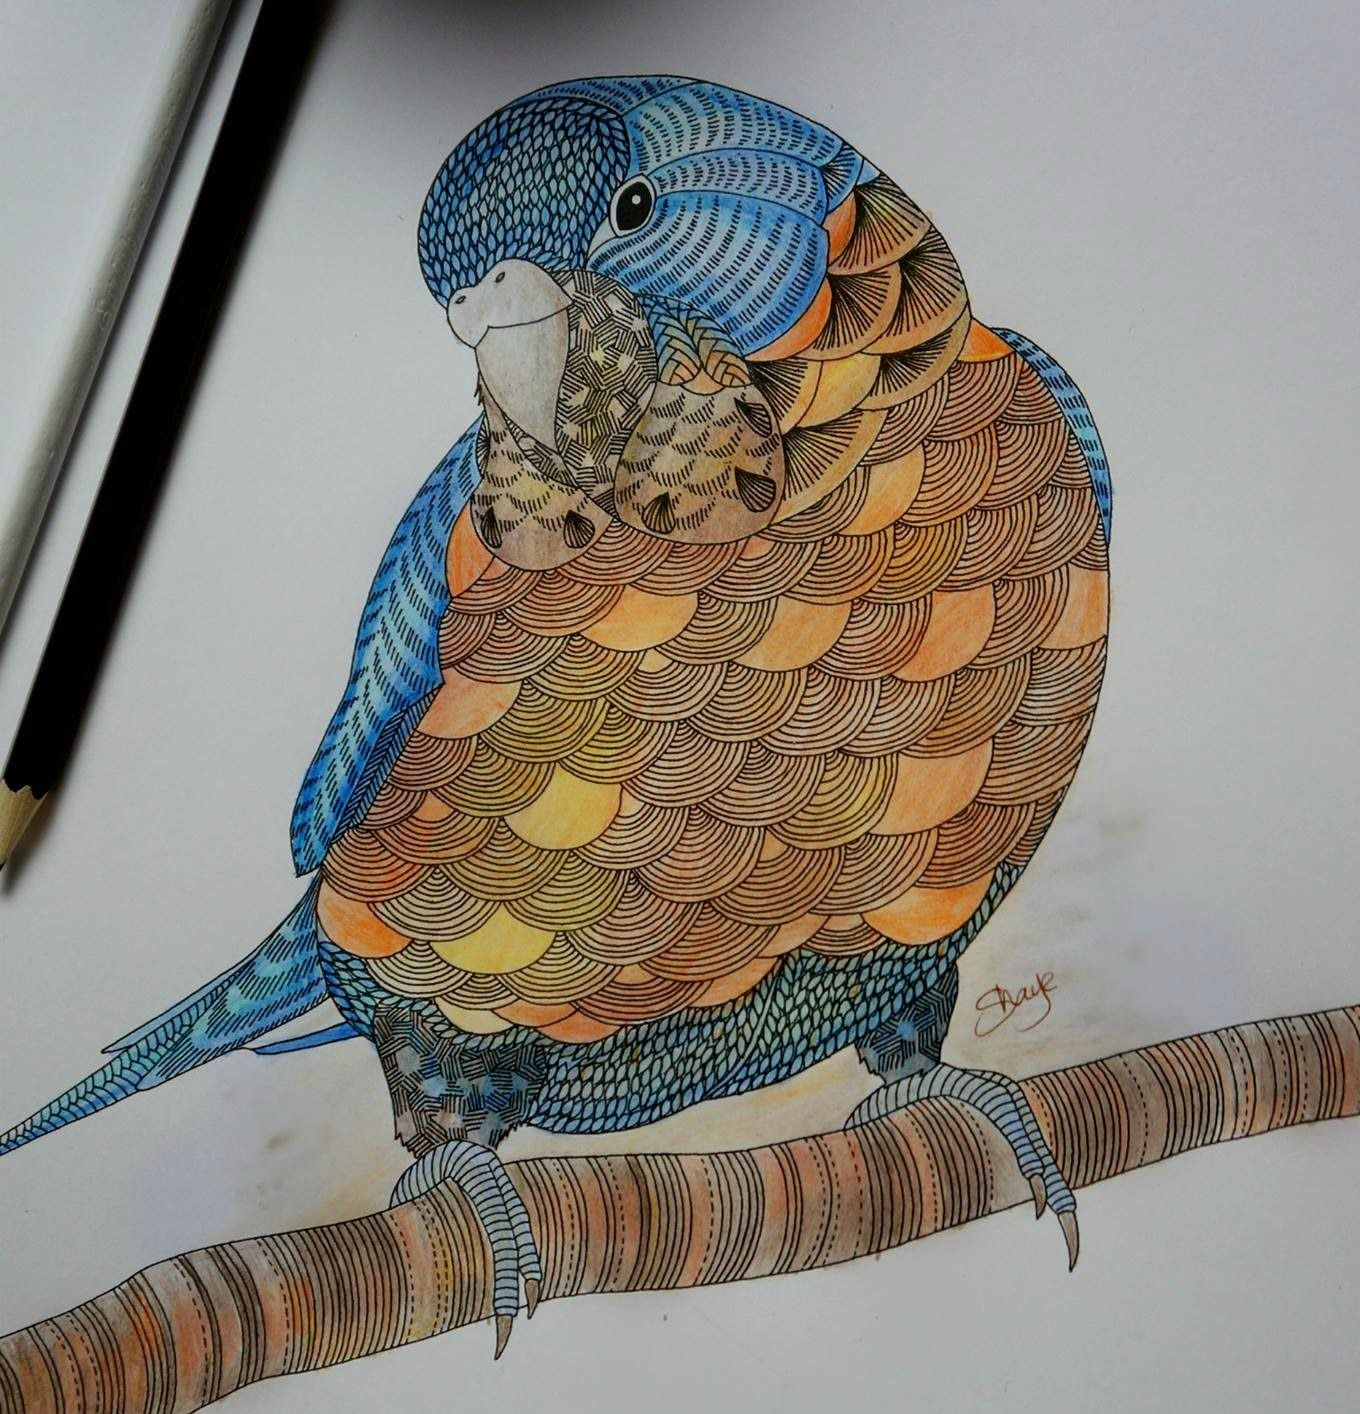 Millie Marotta39s Animal Kingdom Bird Colouring with